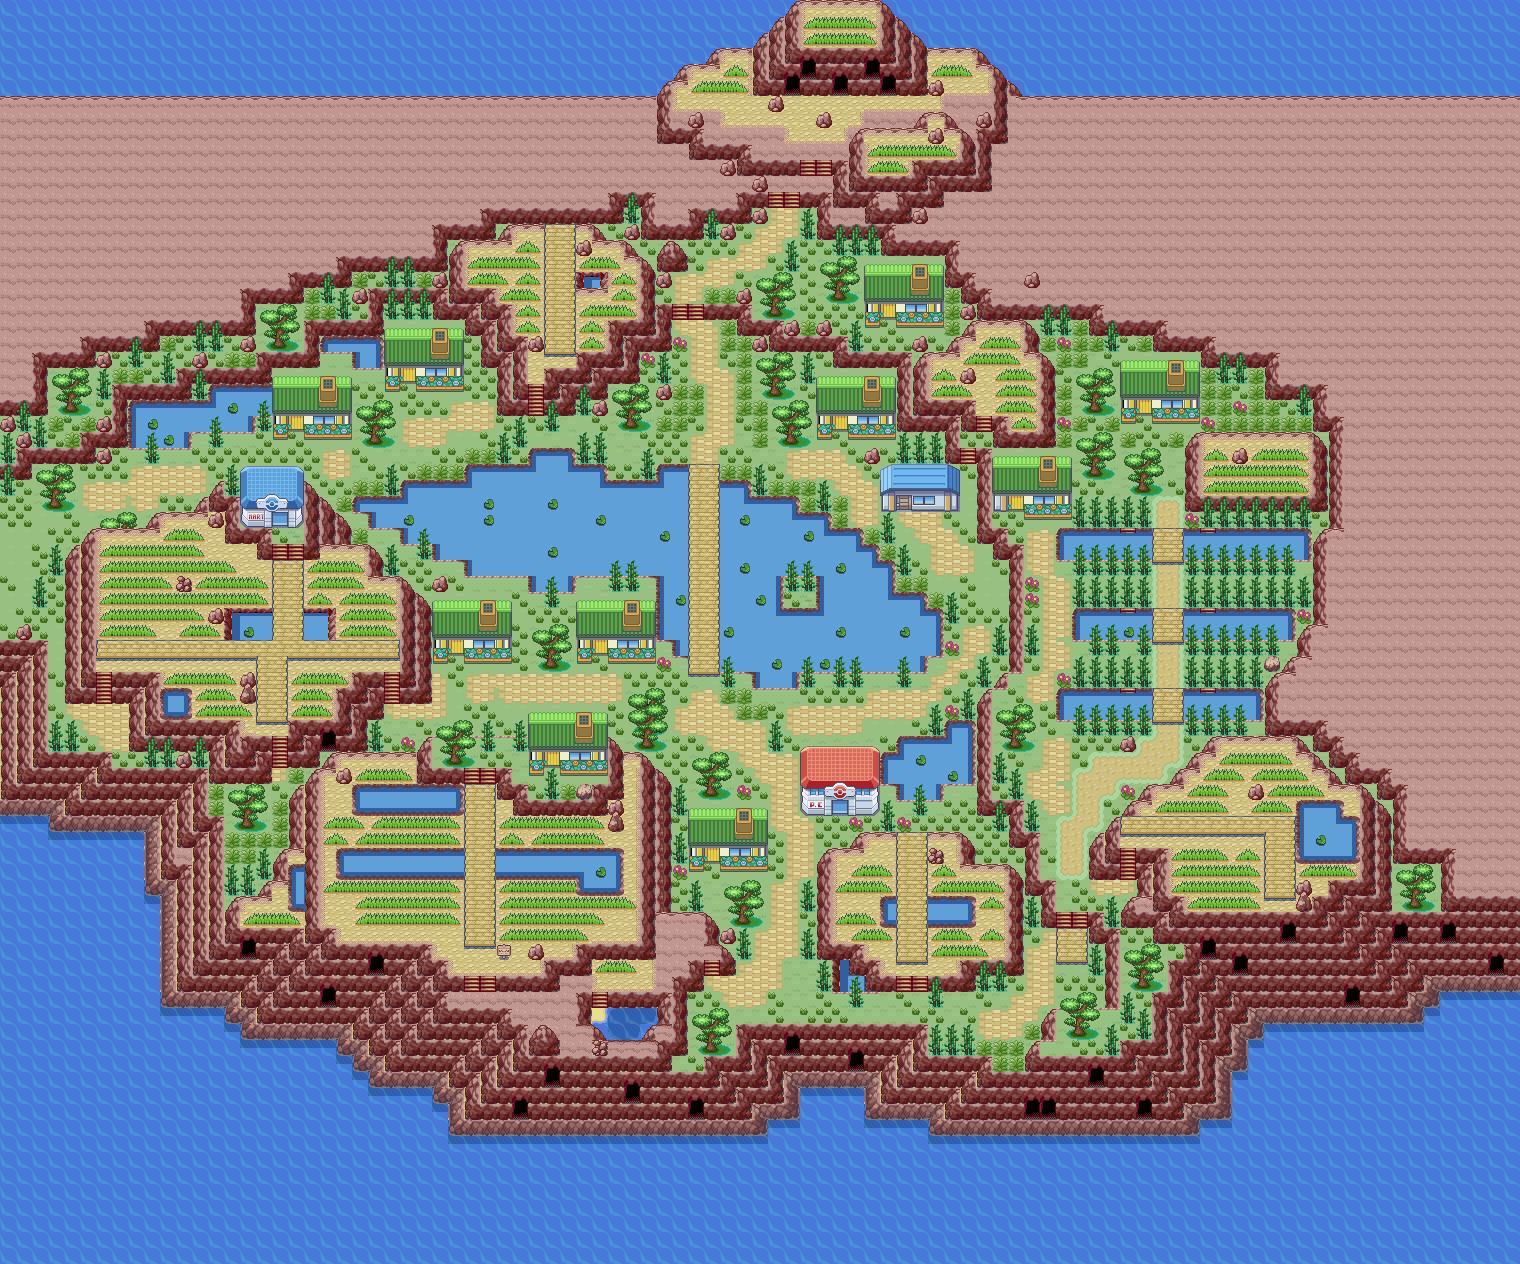 Custom maps on pokemon fakemon game deviantart gba pkmn hack pokemon 6 sulfurine by dragon du 22 gumiabroncs Image collections